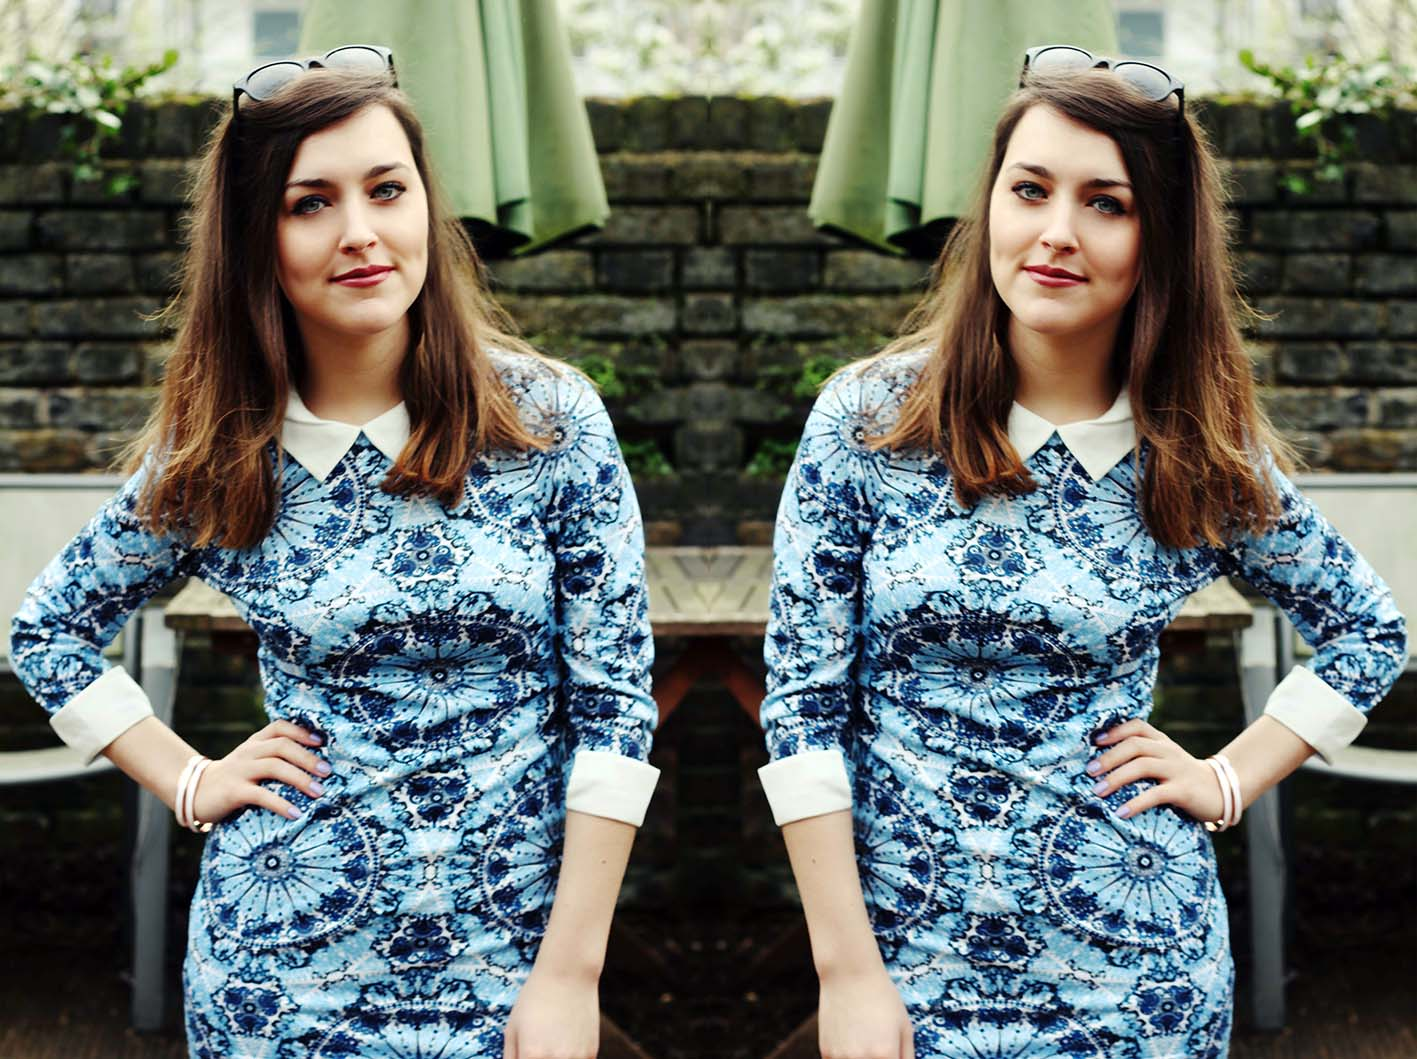 tk maxx dresses bloggers daisy kent